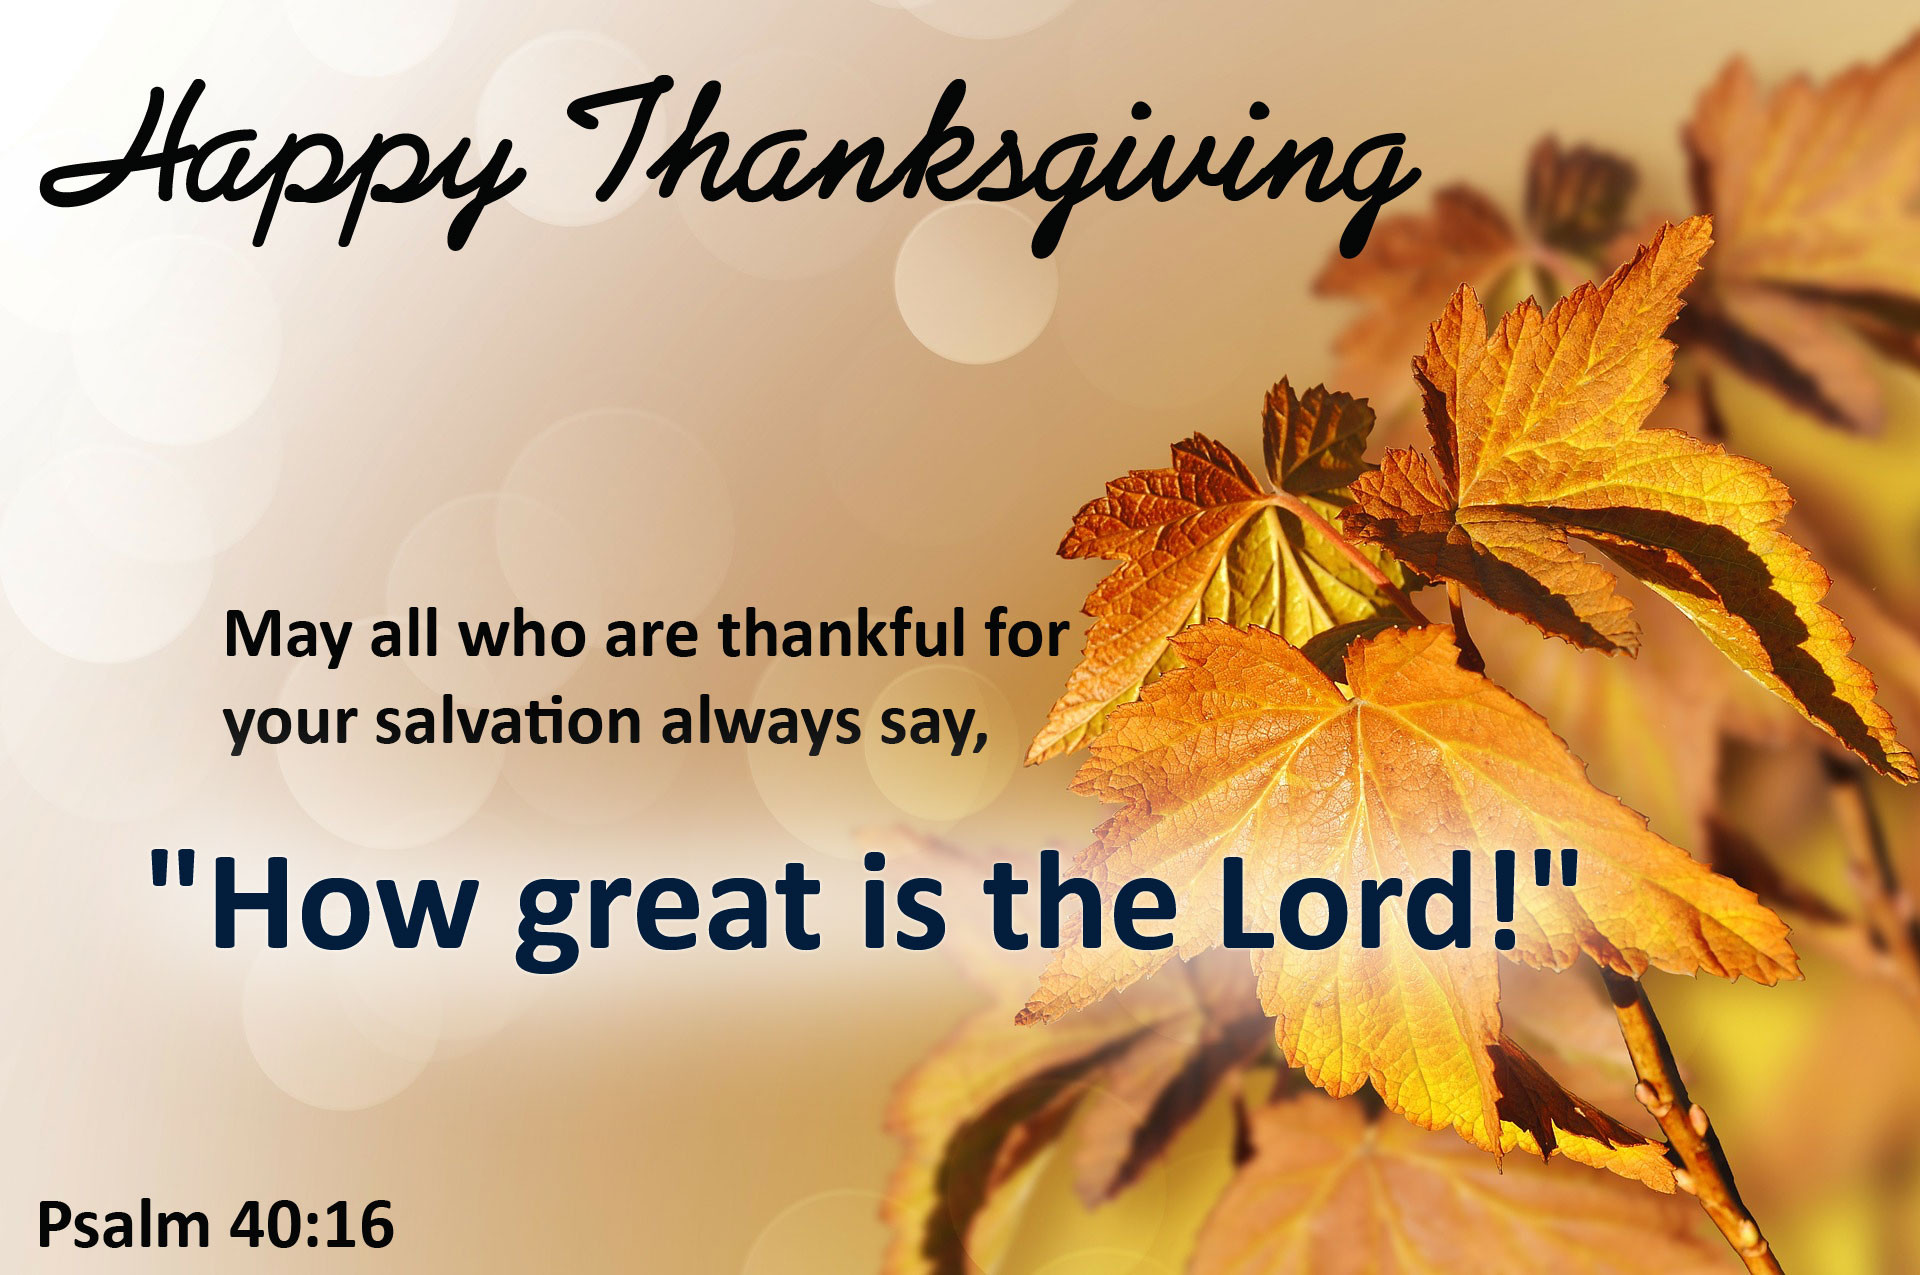 1920x1275, Christian Thanksgiving Wallpaper - Thanksgiving Prayer Lost Loved One - HD Wallpaper